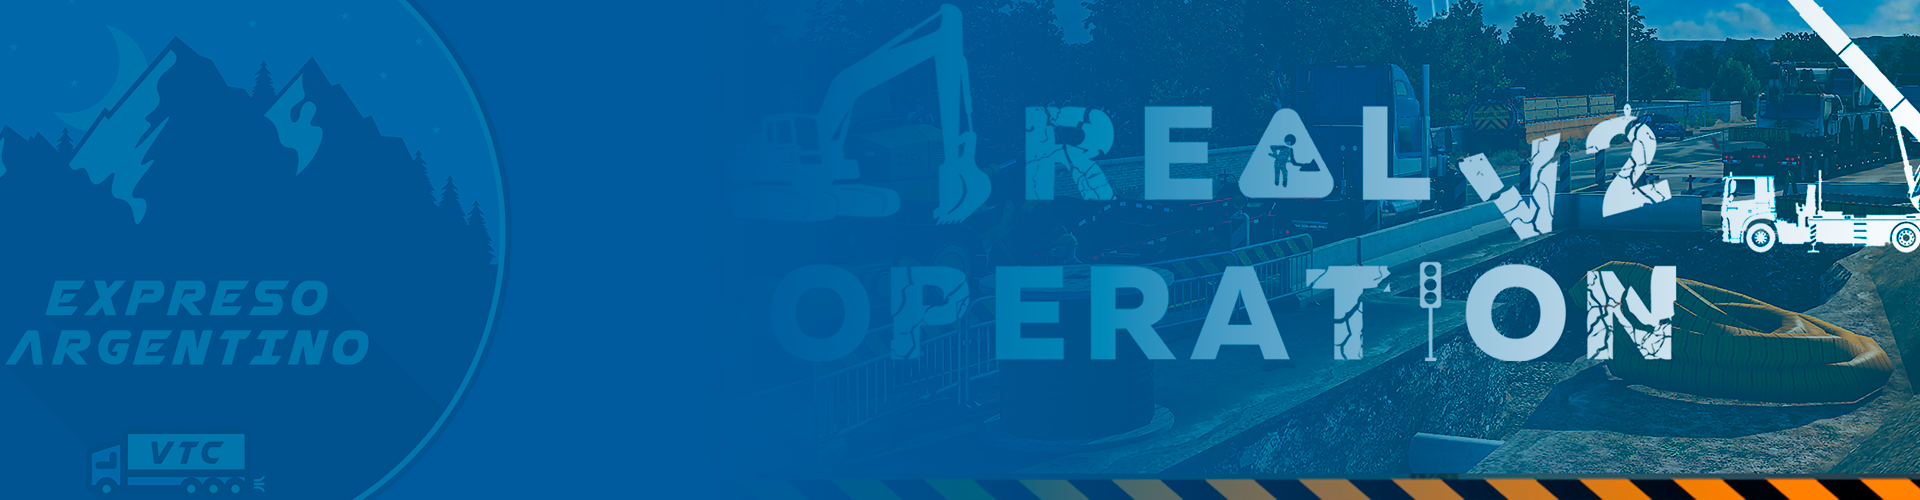 CONVOY EA VTC | REAL OPERATION 01/08